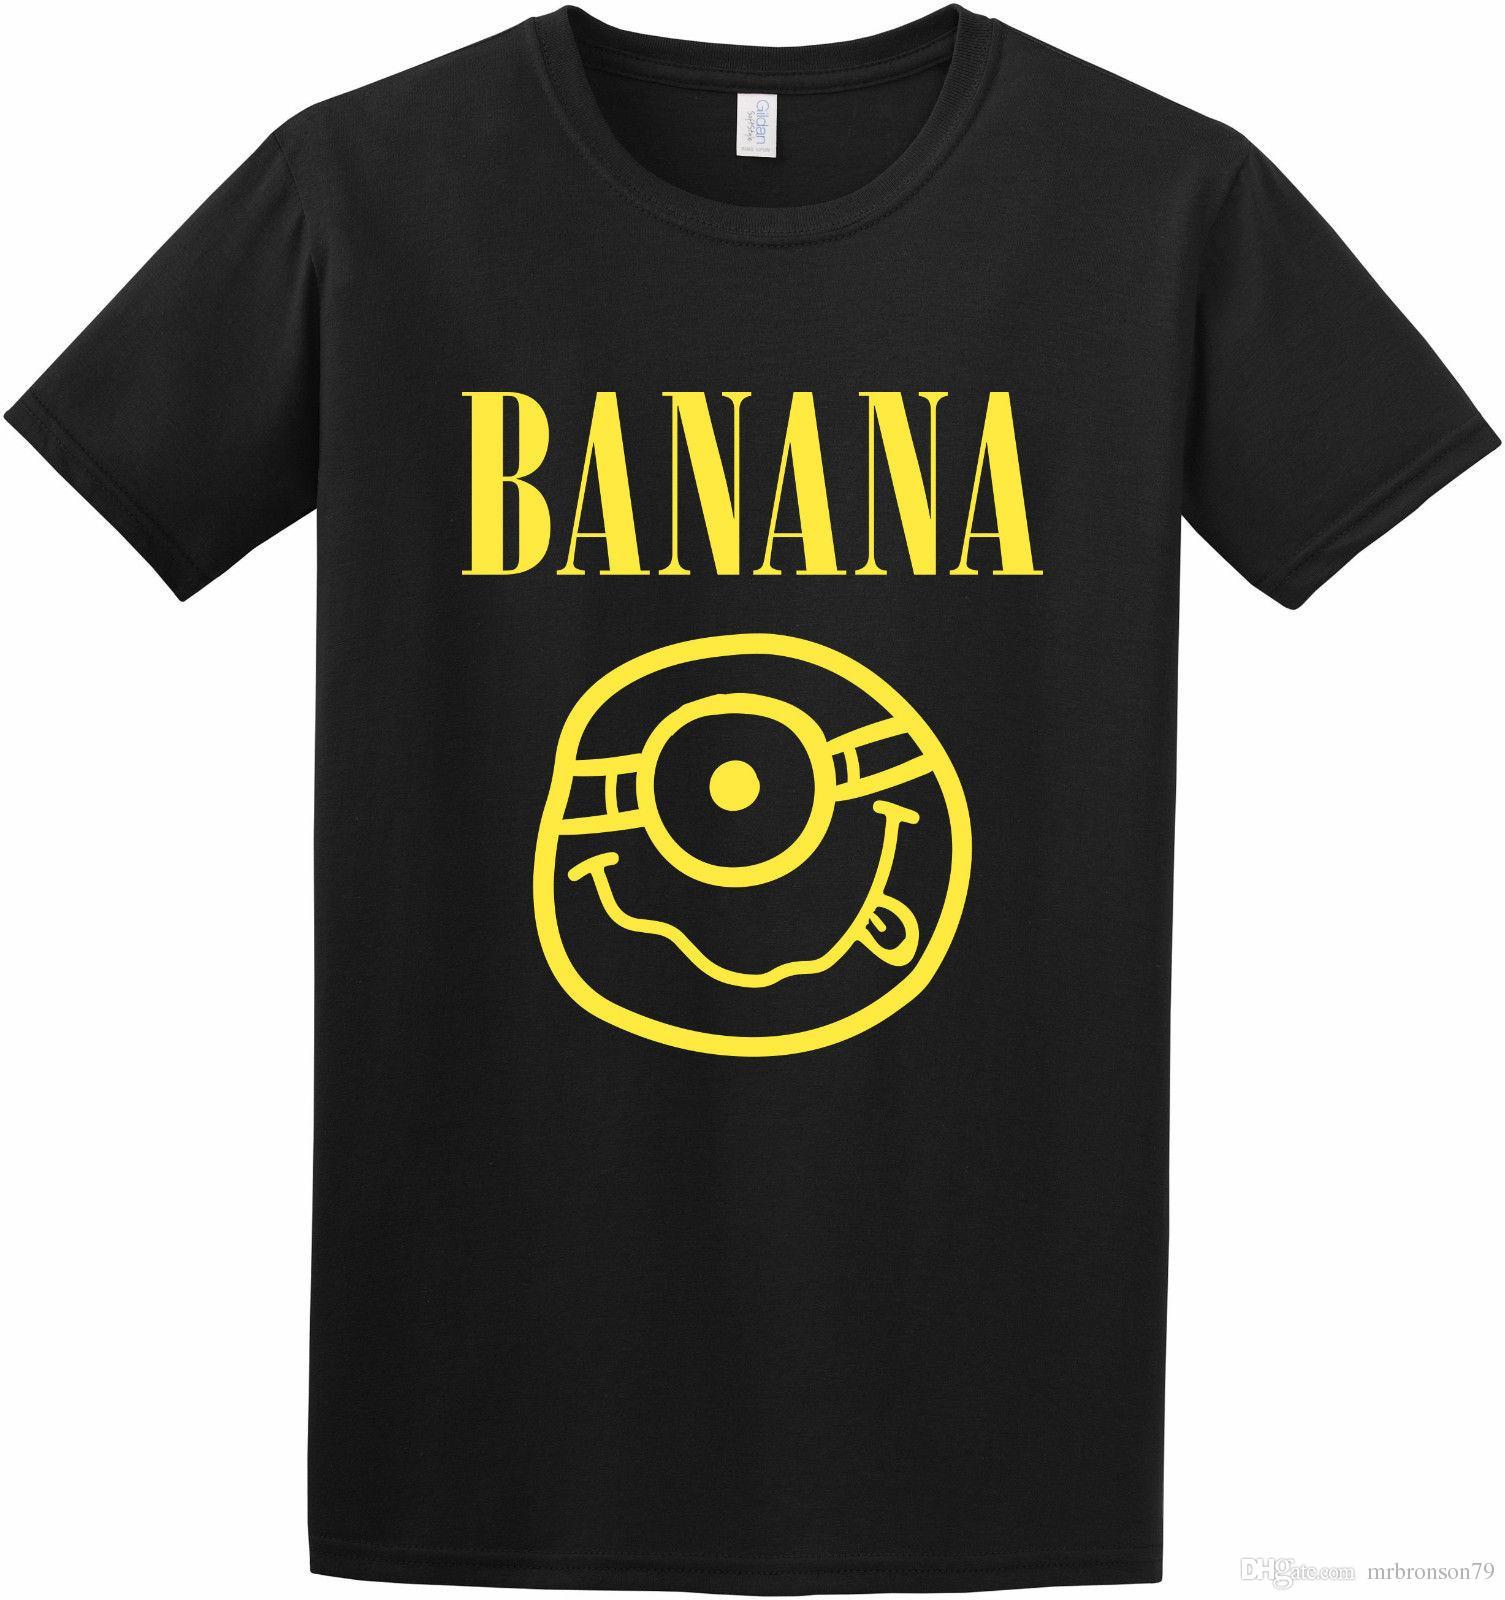 1b965ef62b Banana Funny Top Tee New Designer Parody Kids Adult Inspired T Shirt ...